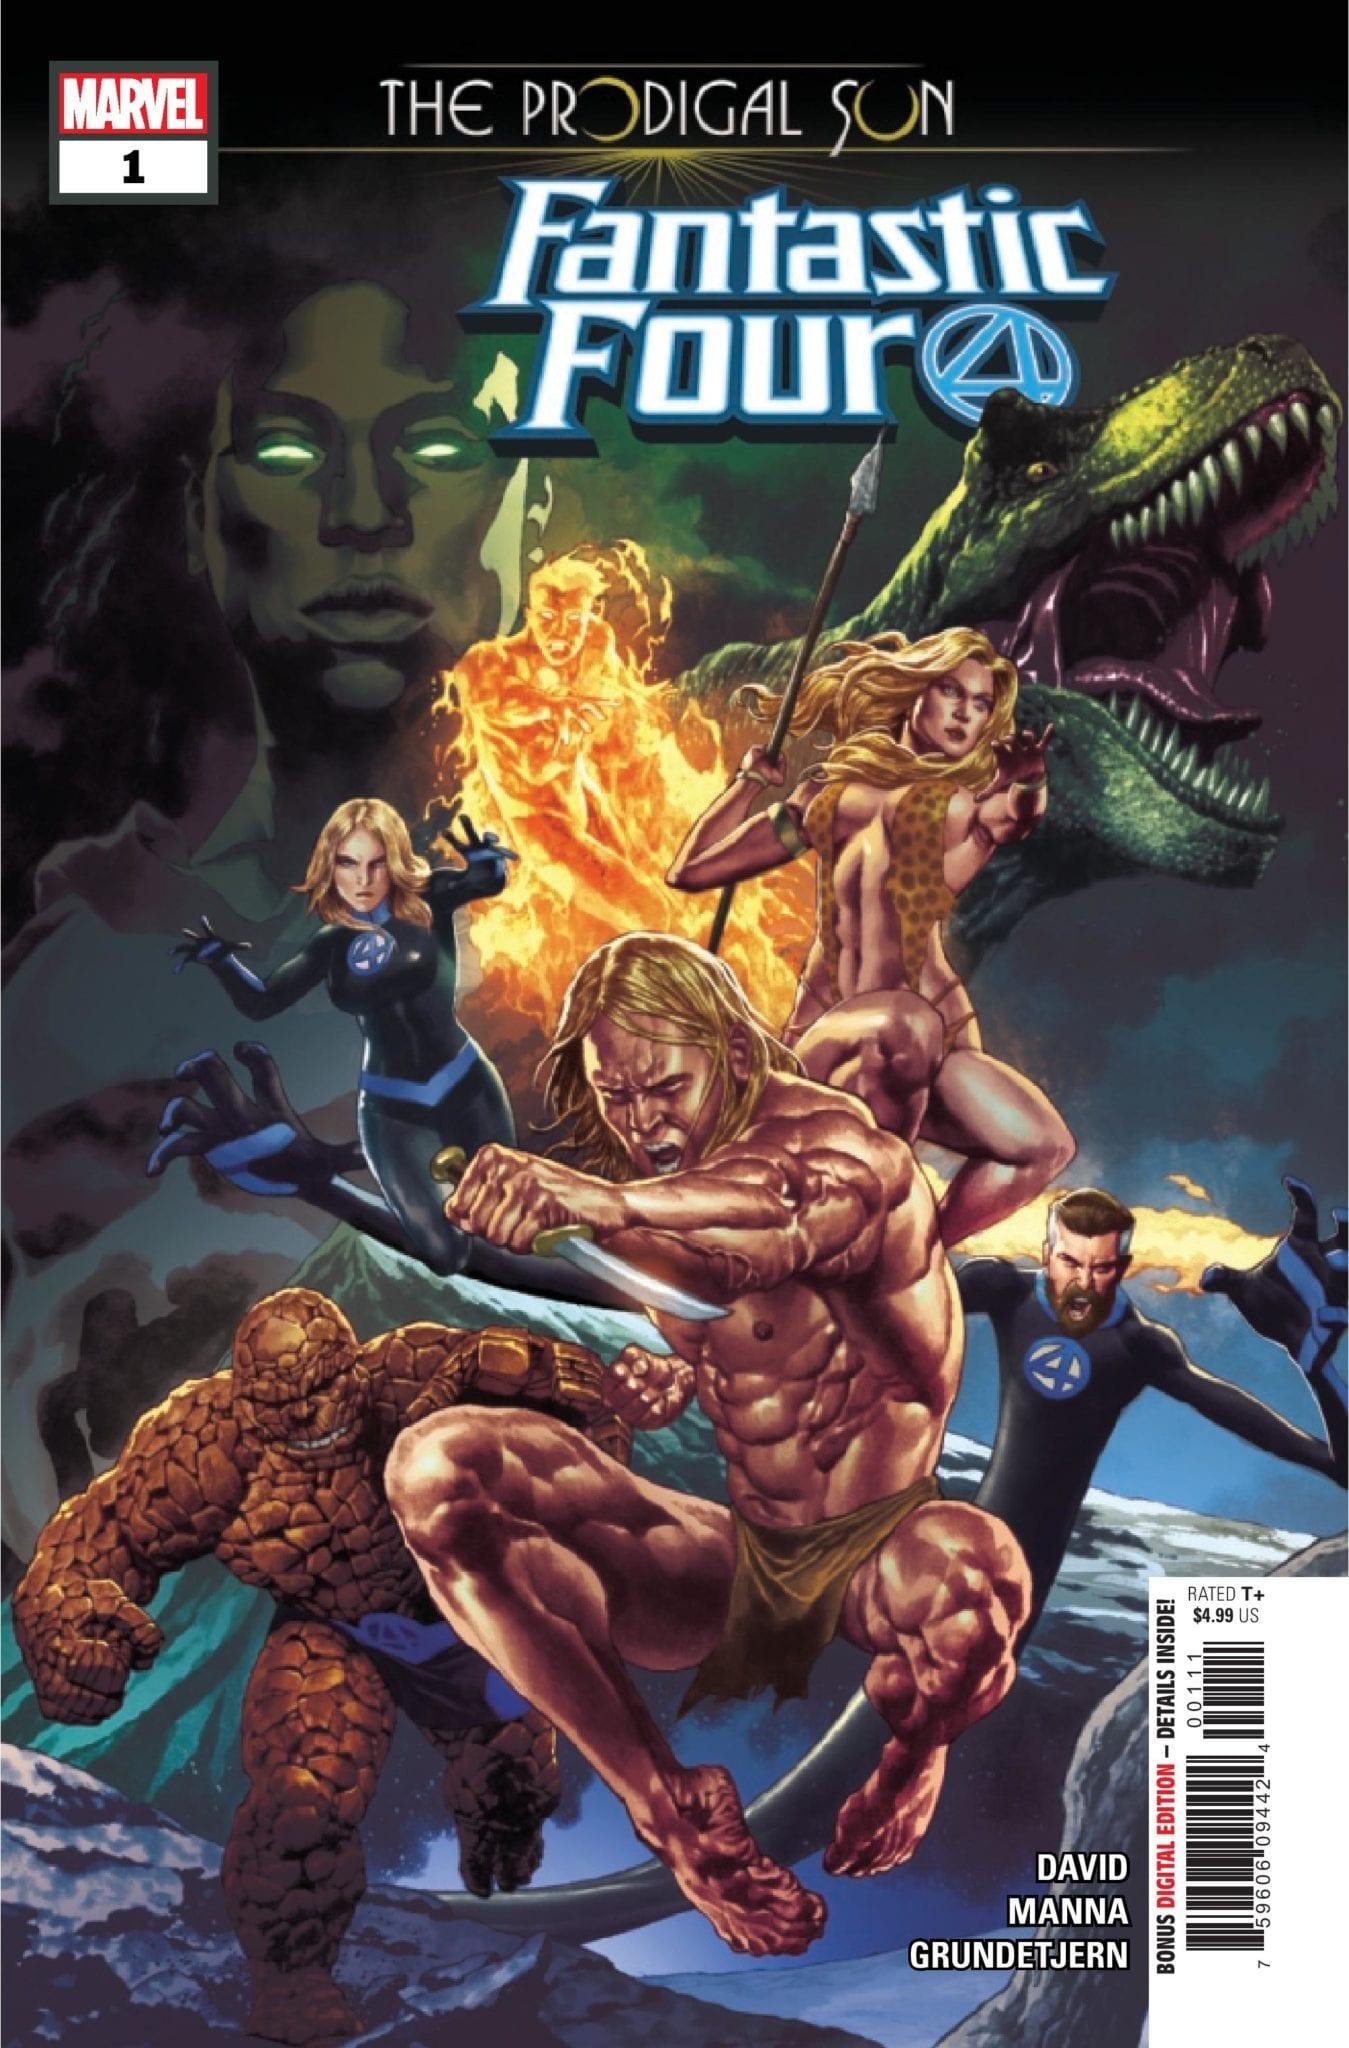 Marvel Comics Exclusive Preview • FANTASTIC FOUR: THE PRODIGAL SUN #1